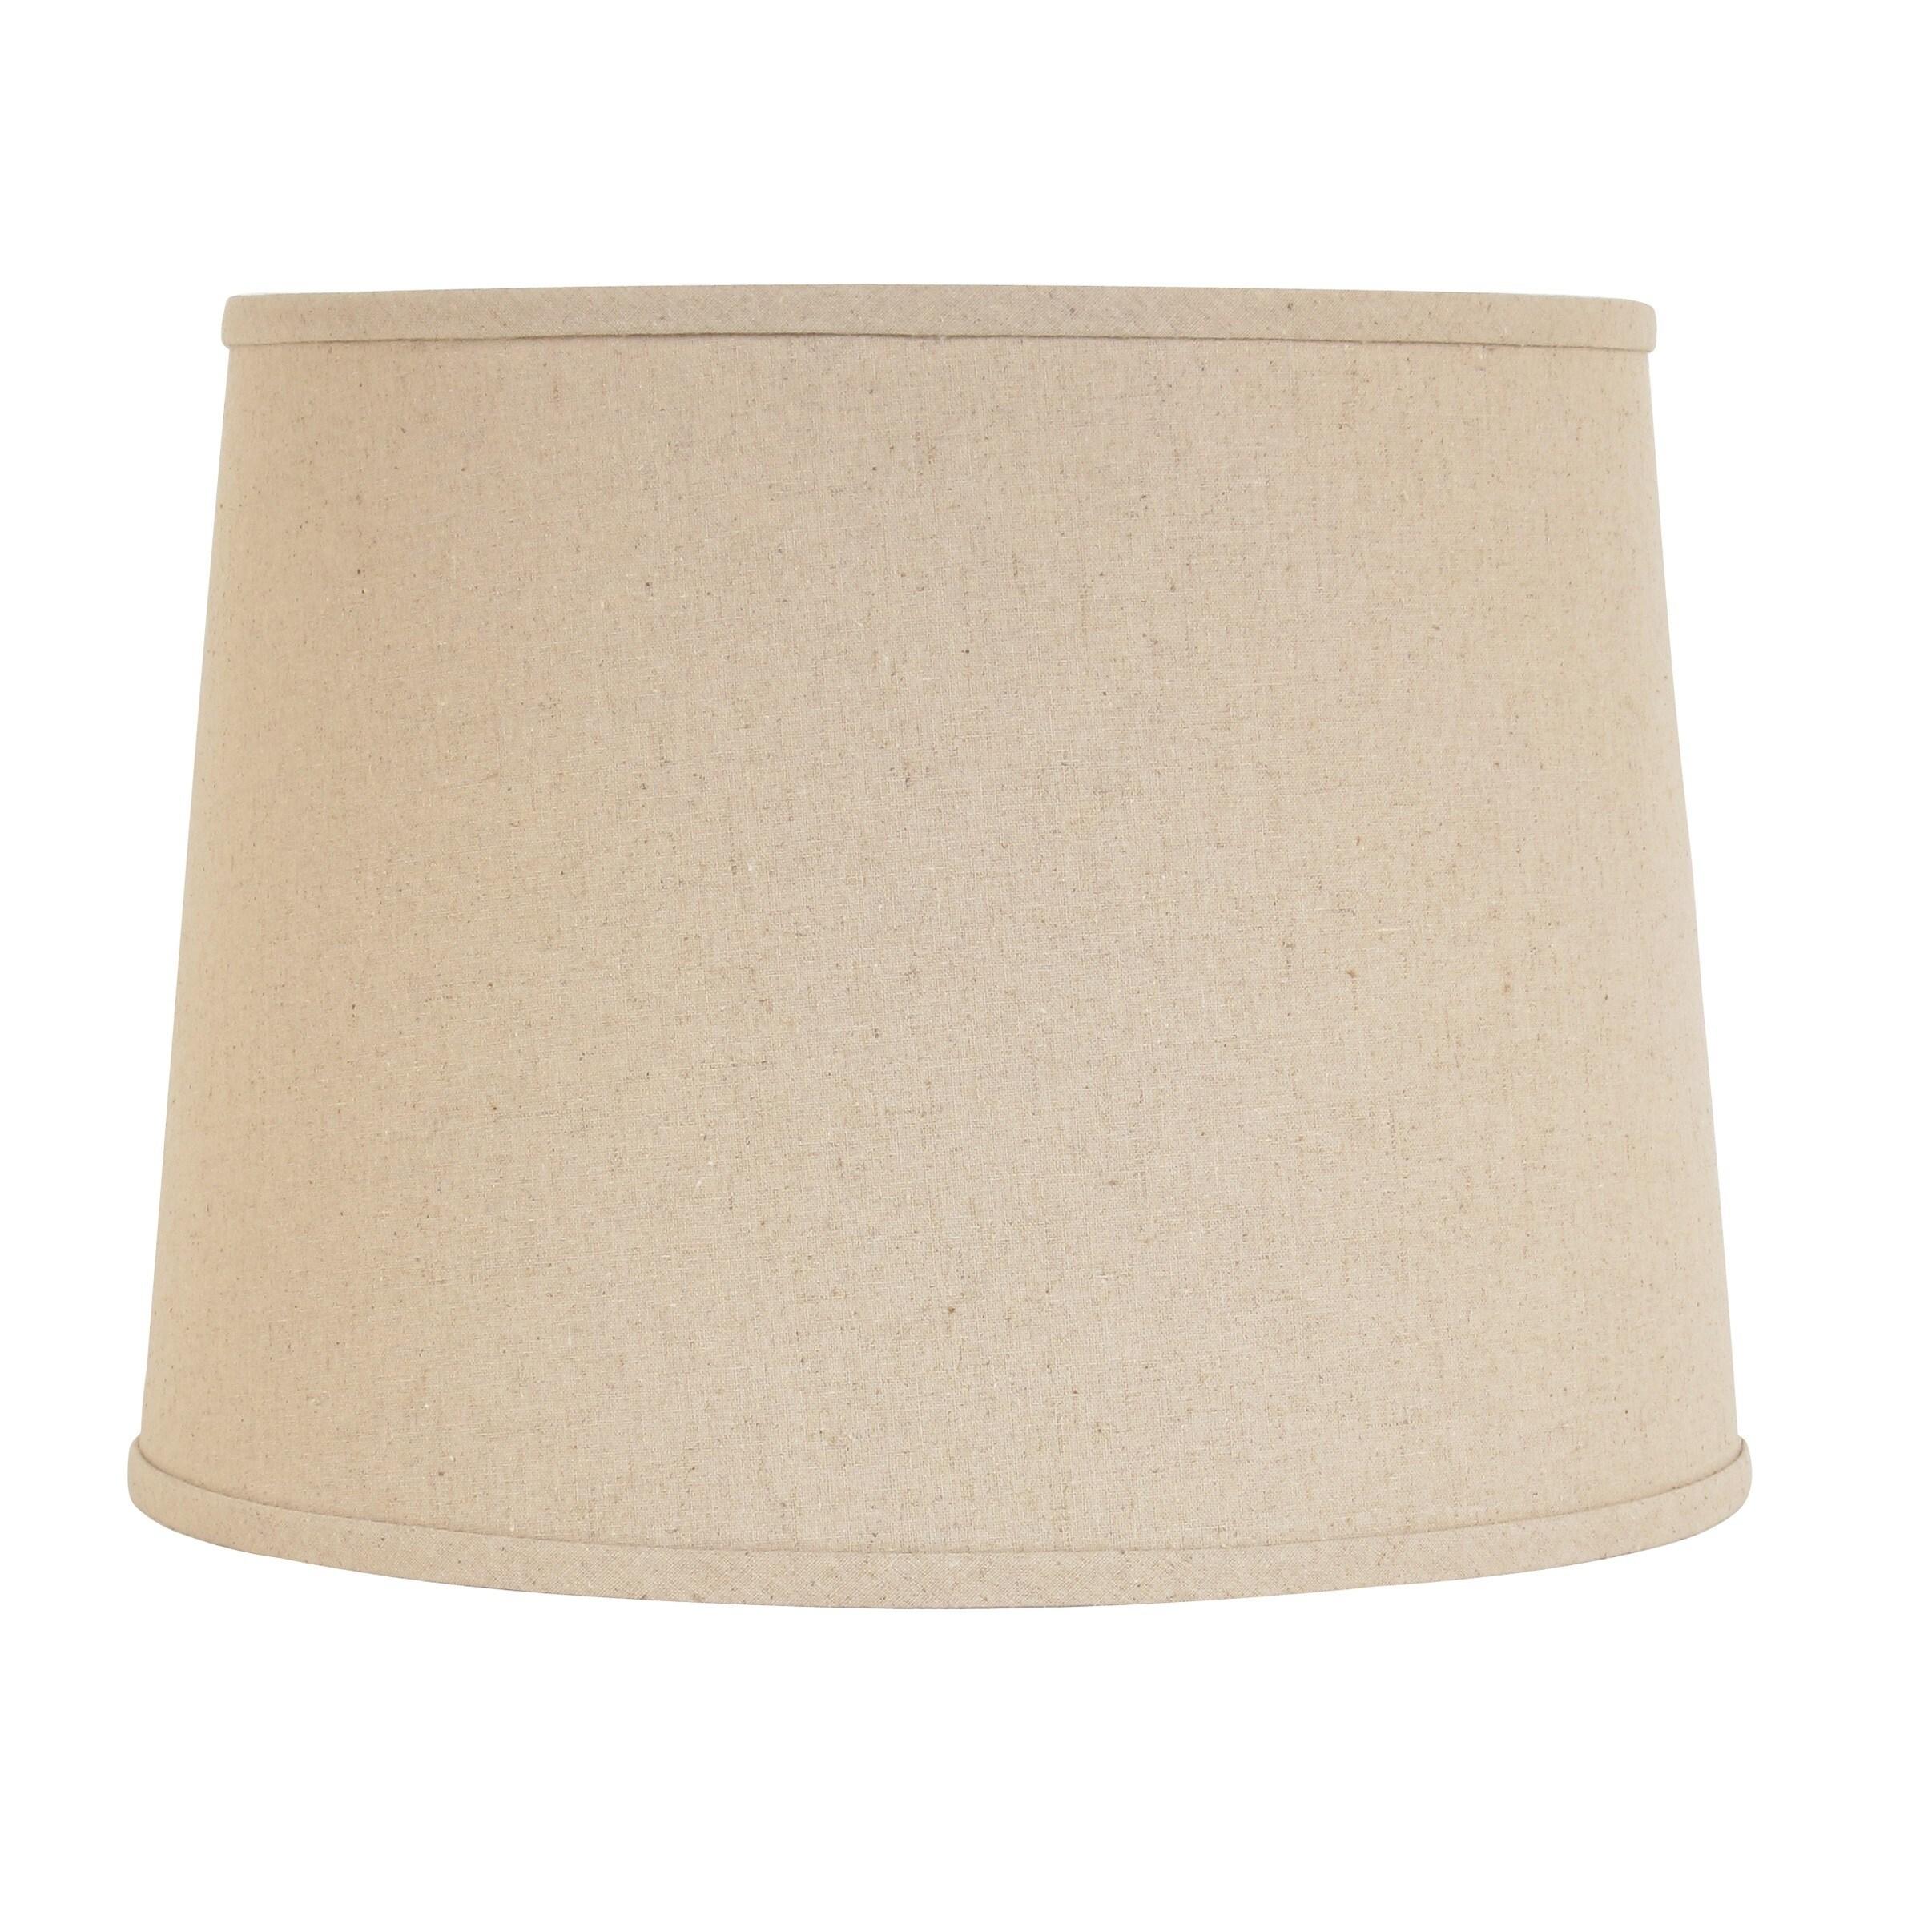 Briarwood Home Decor Designer Light Tan Hardback Empire S...